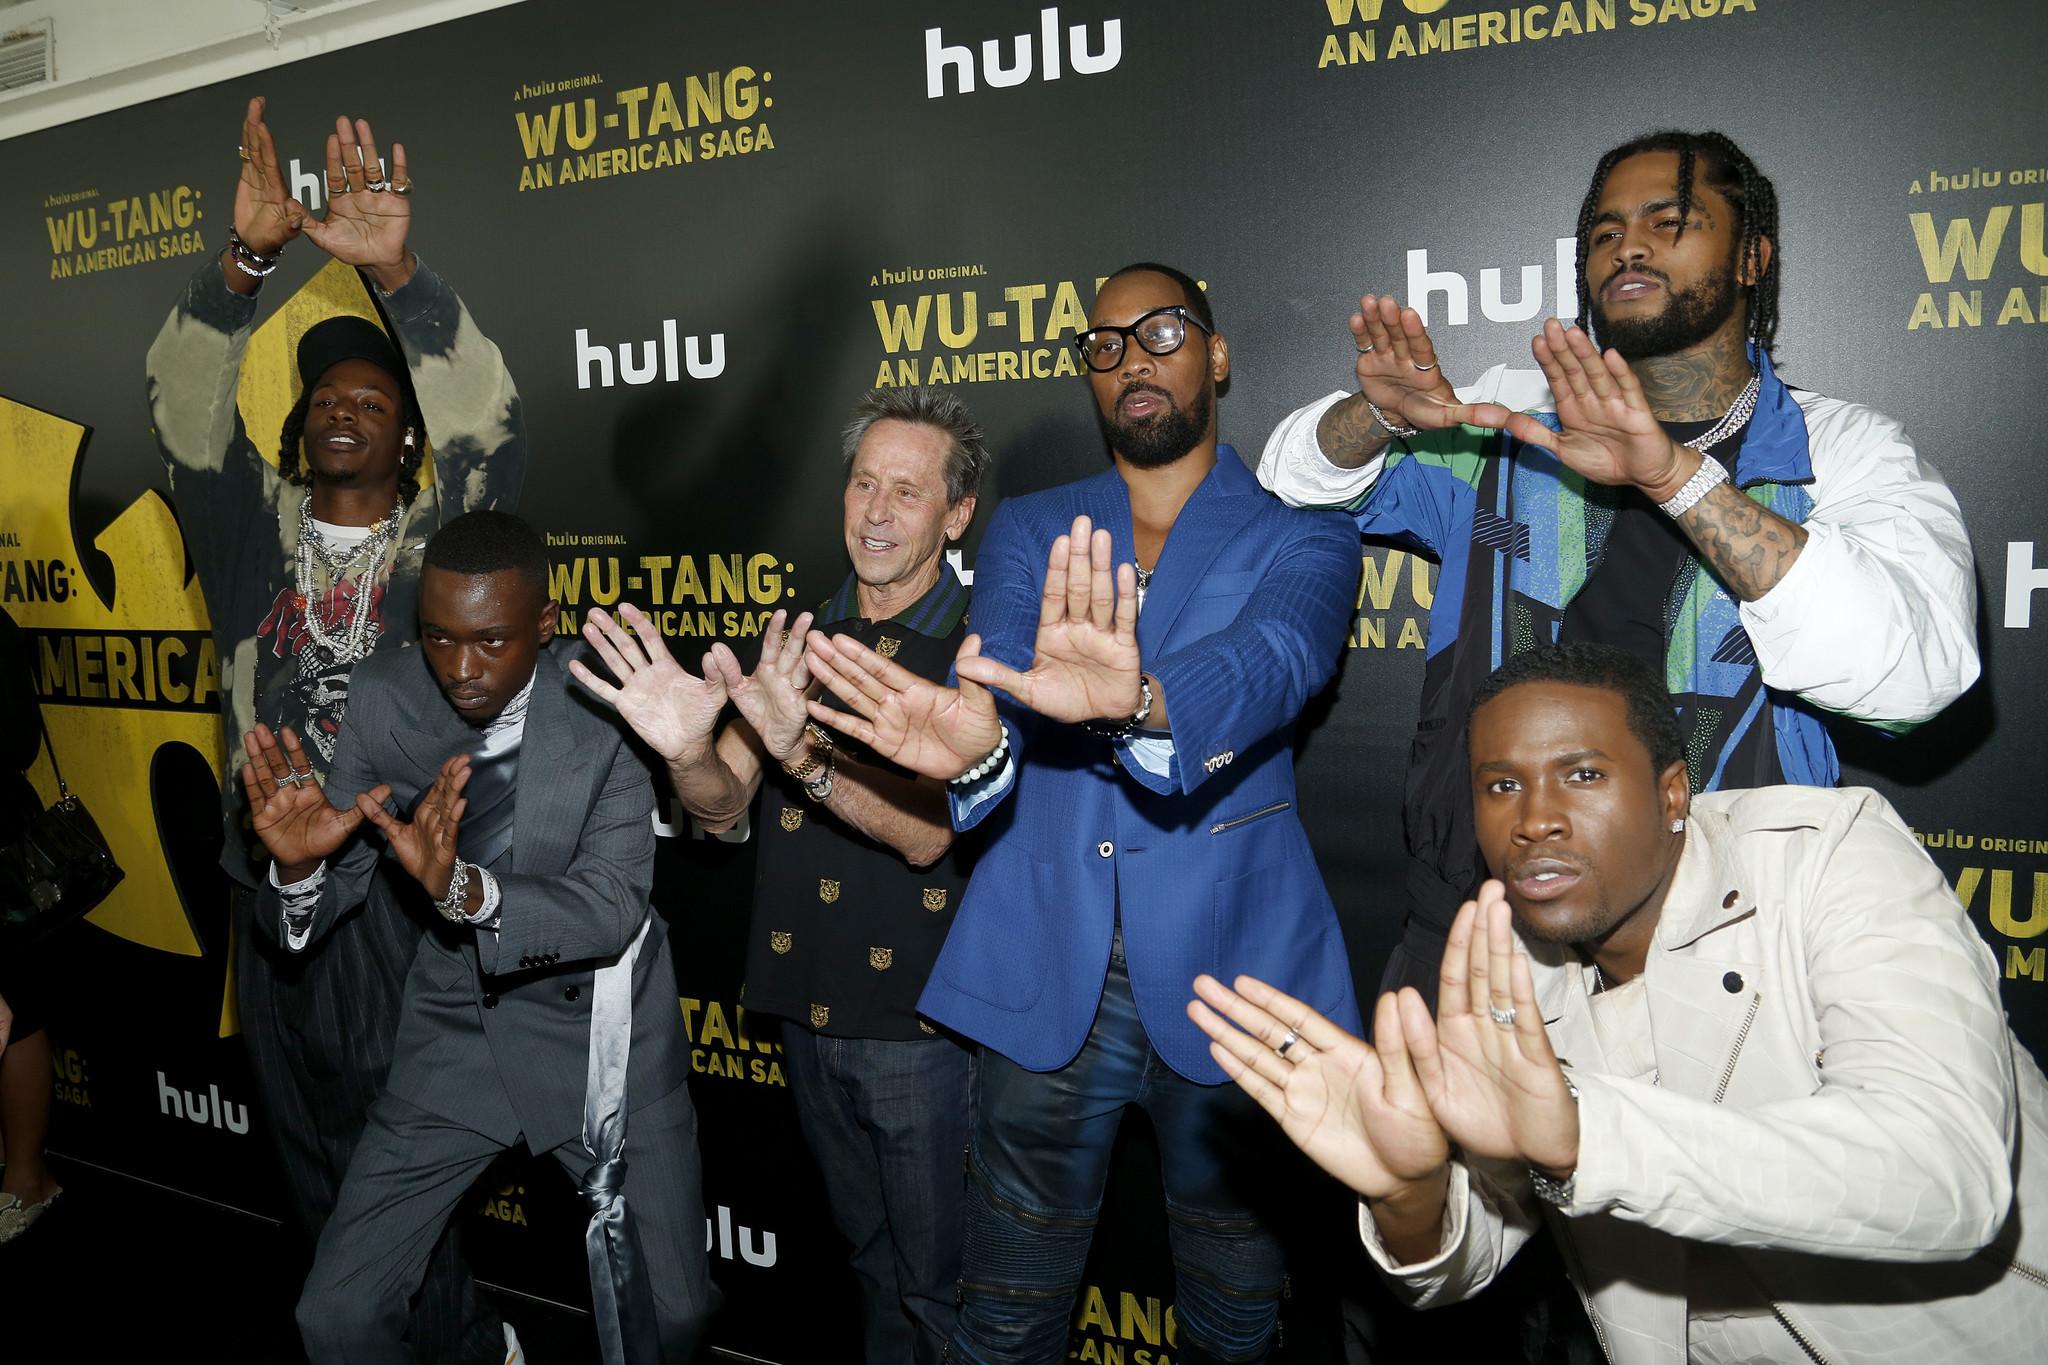 Wu-Tang Clan series renewed for second season